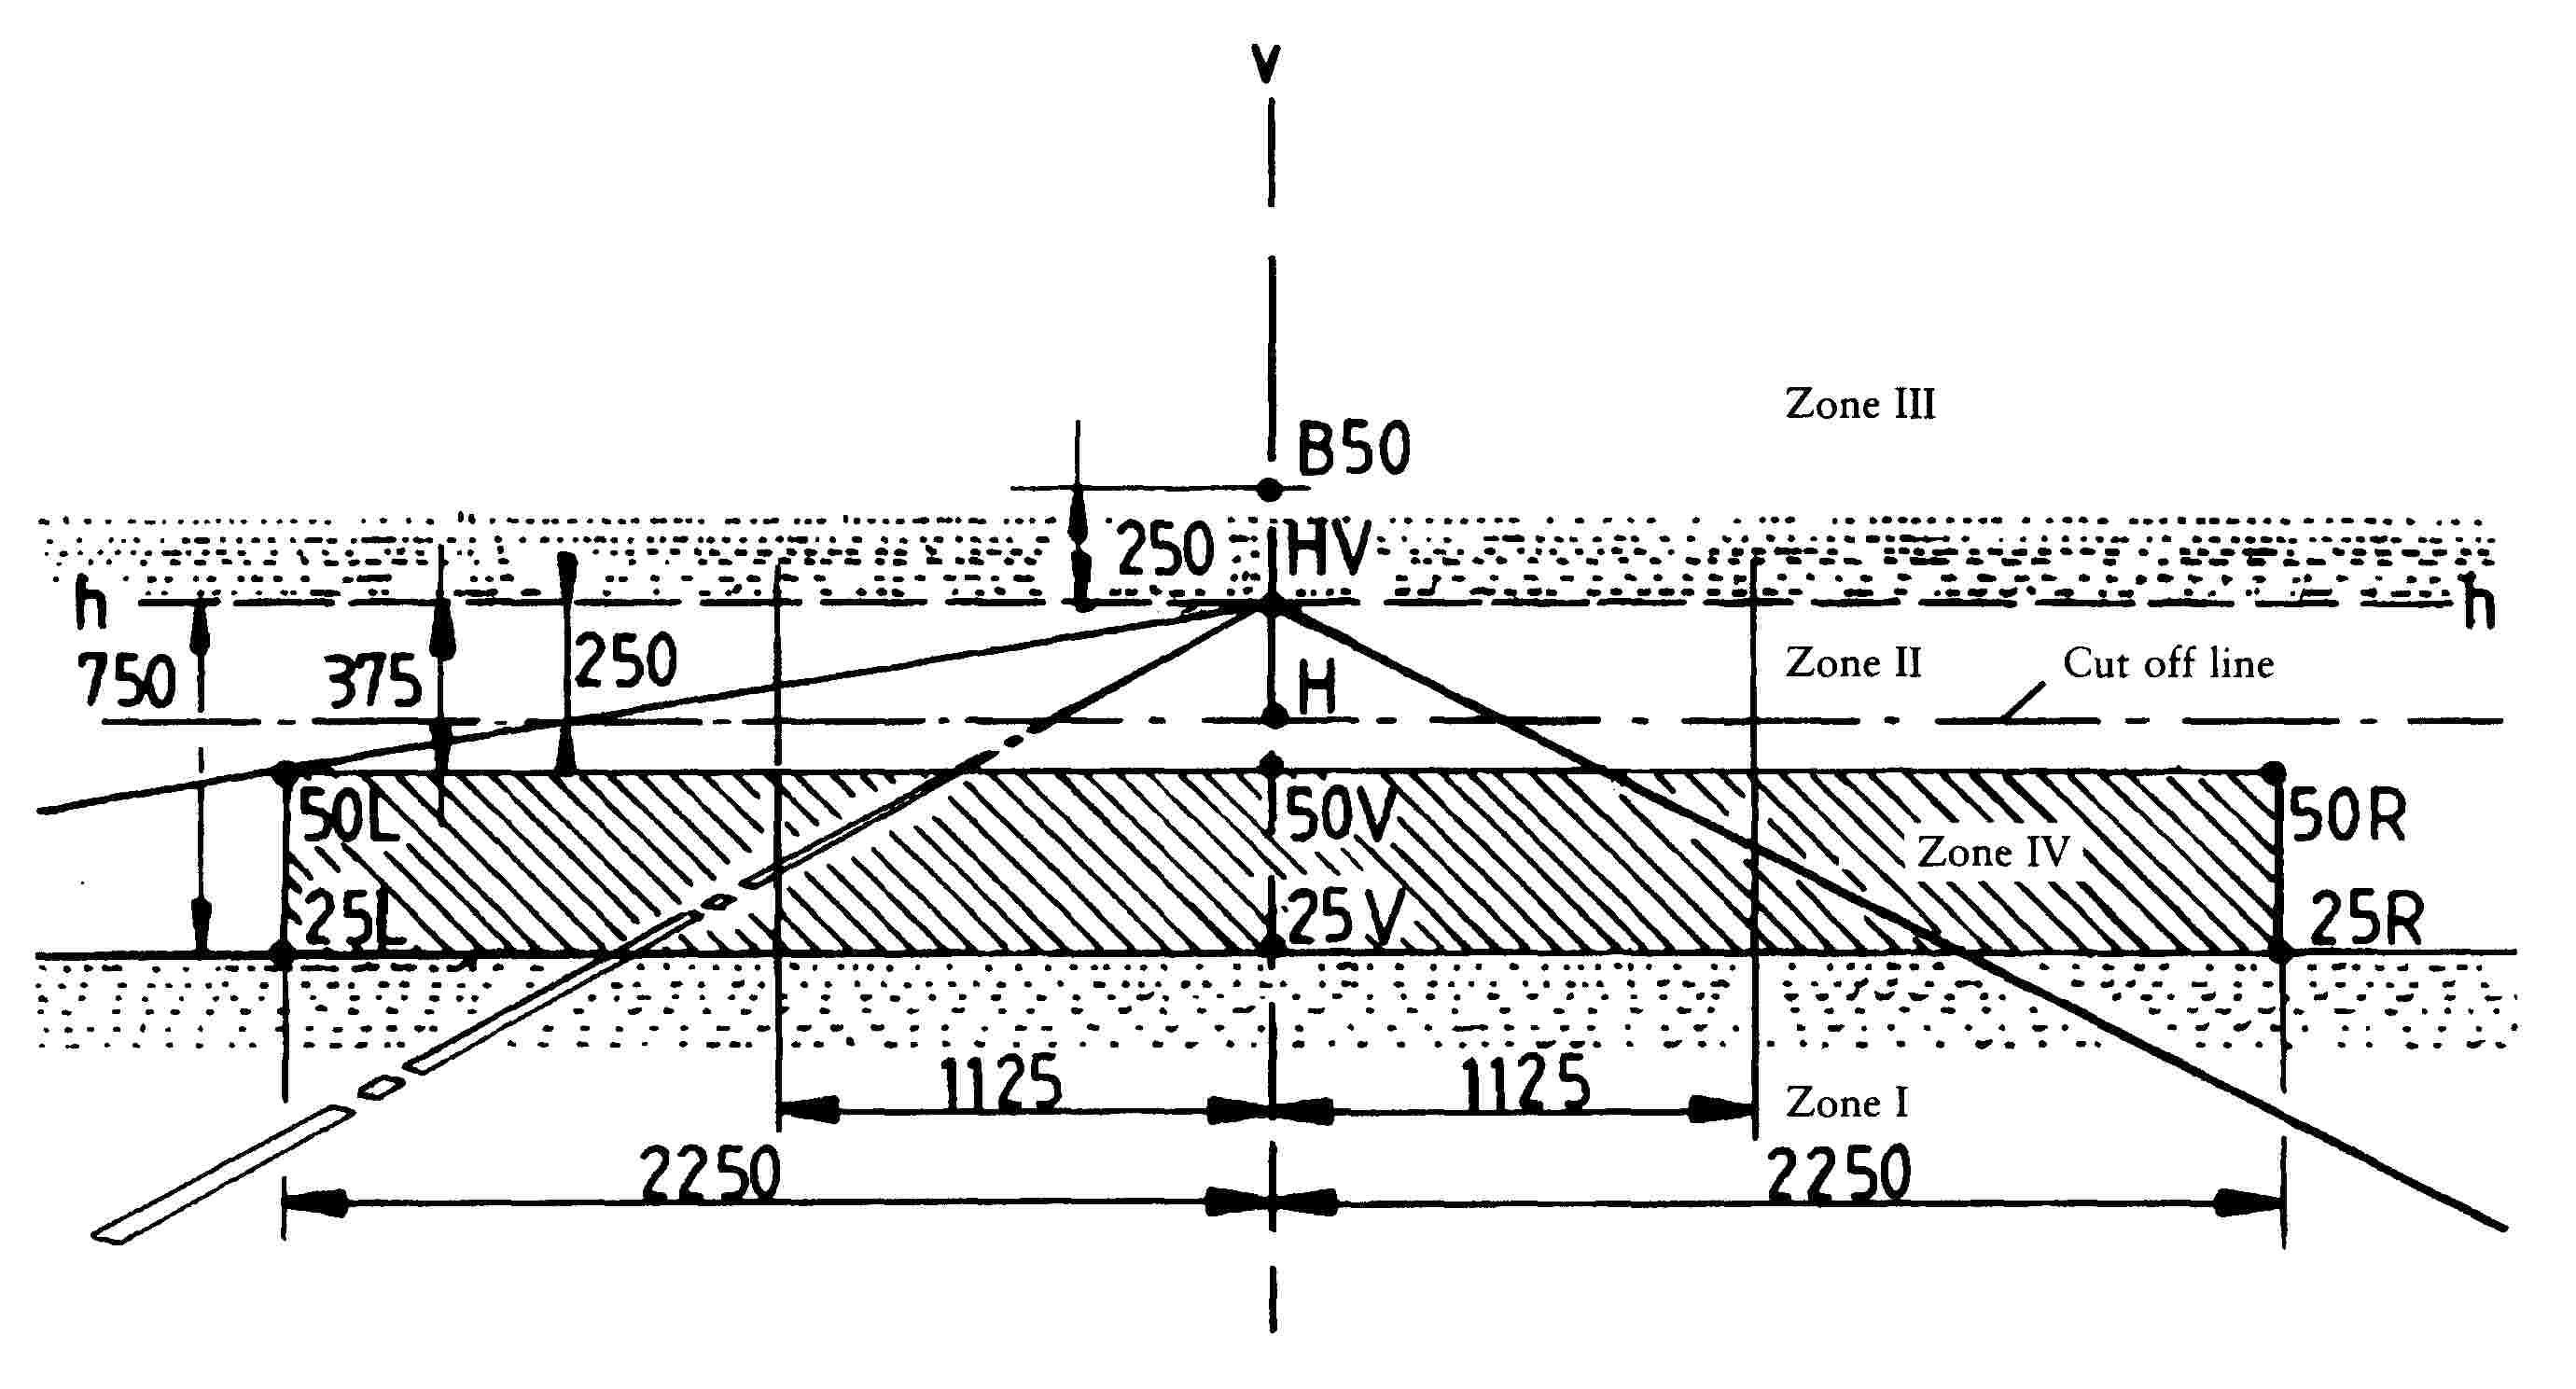 Eur Lex 01997l0024 20060908 En The 25l Motor Data Sensor Heating Oxygen Circuit Diagram Of Dimensions In Mm For A Distance 25 M